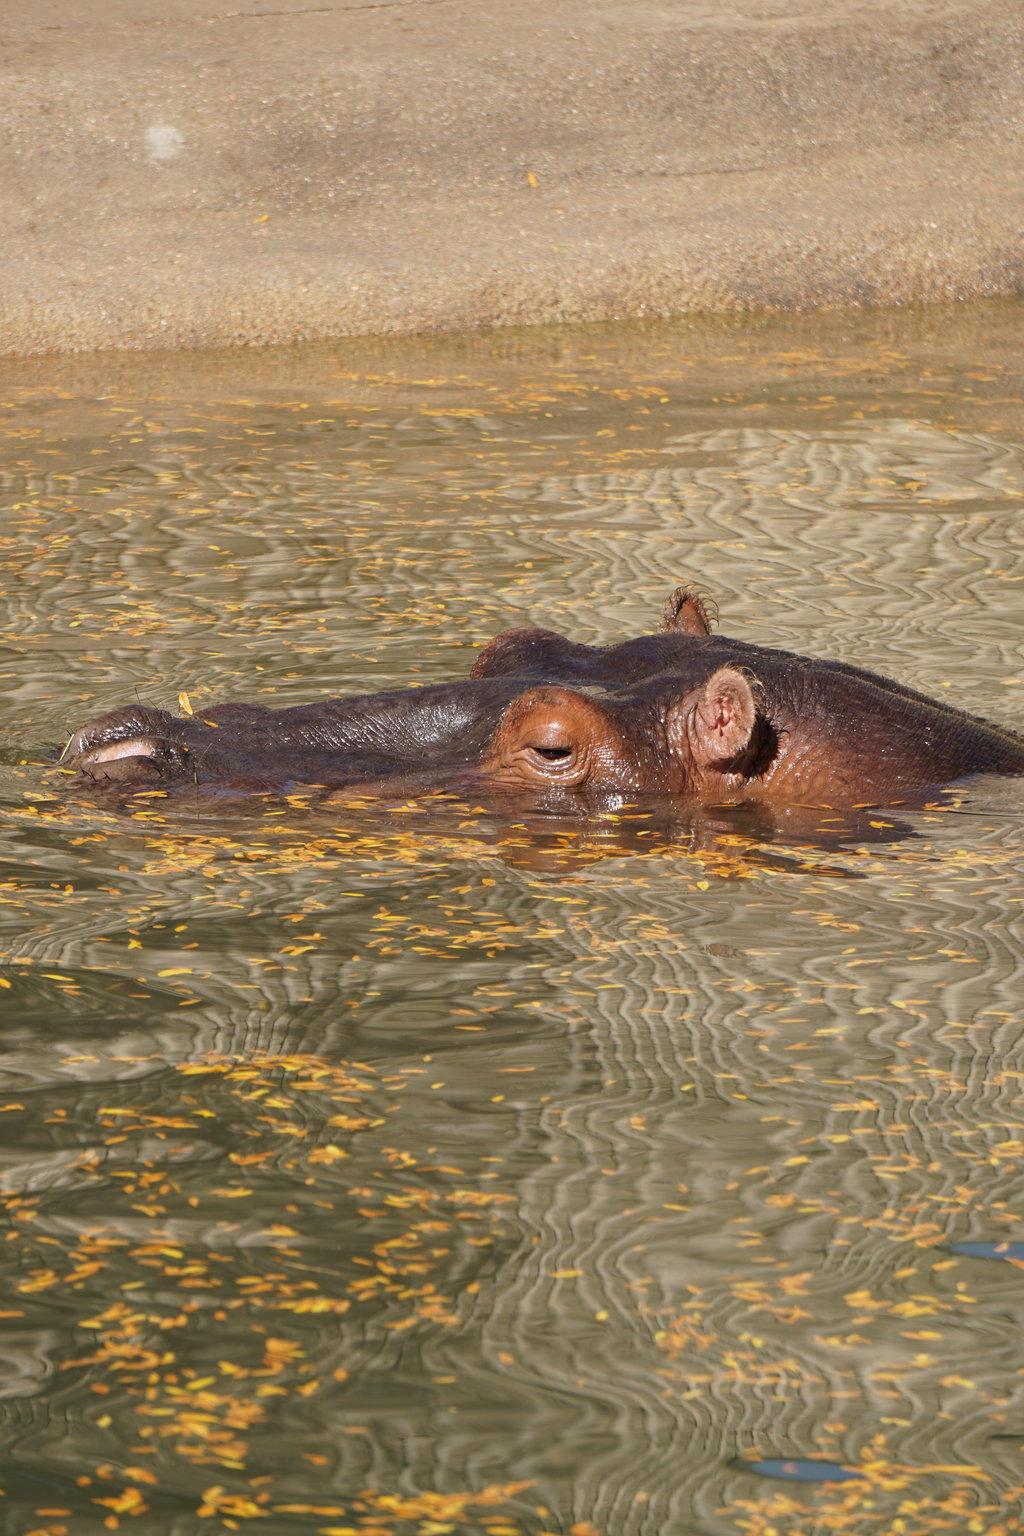 Hippo Lagoon by shinigamisgem